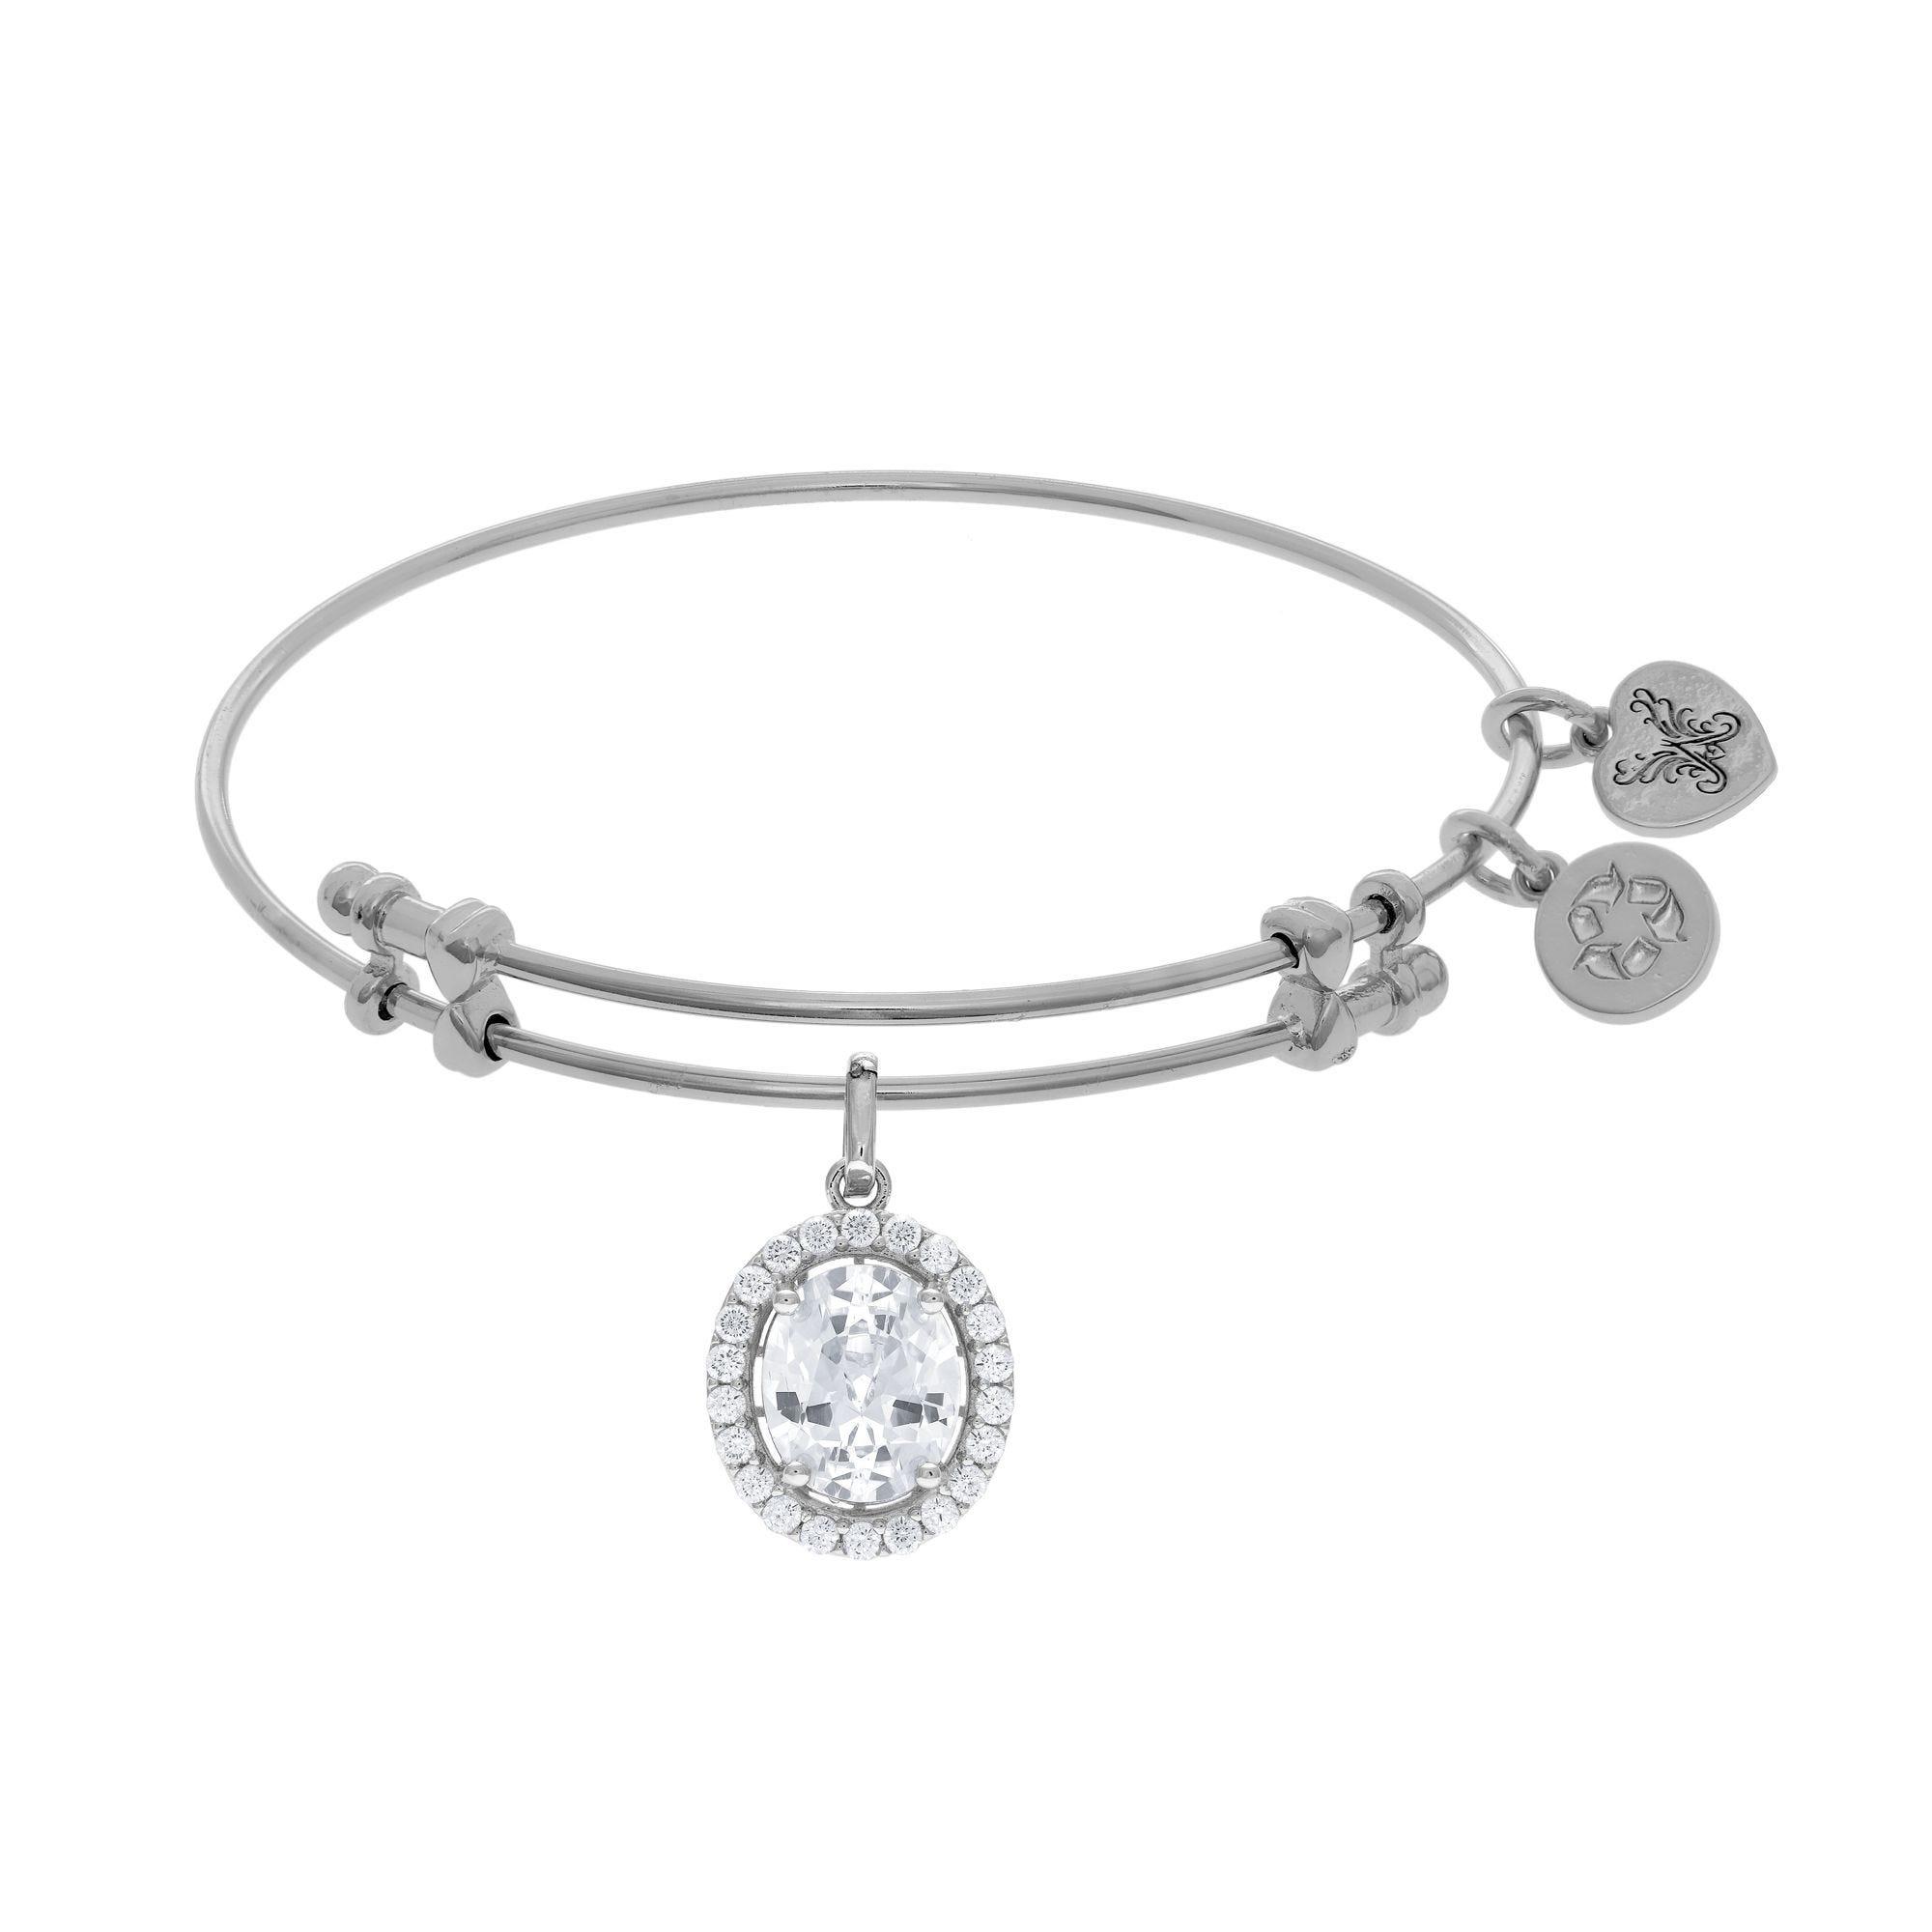 Oval CZ Dangle Charm Bangle Bracelet in White Brass